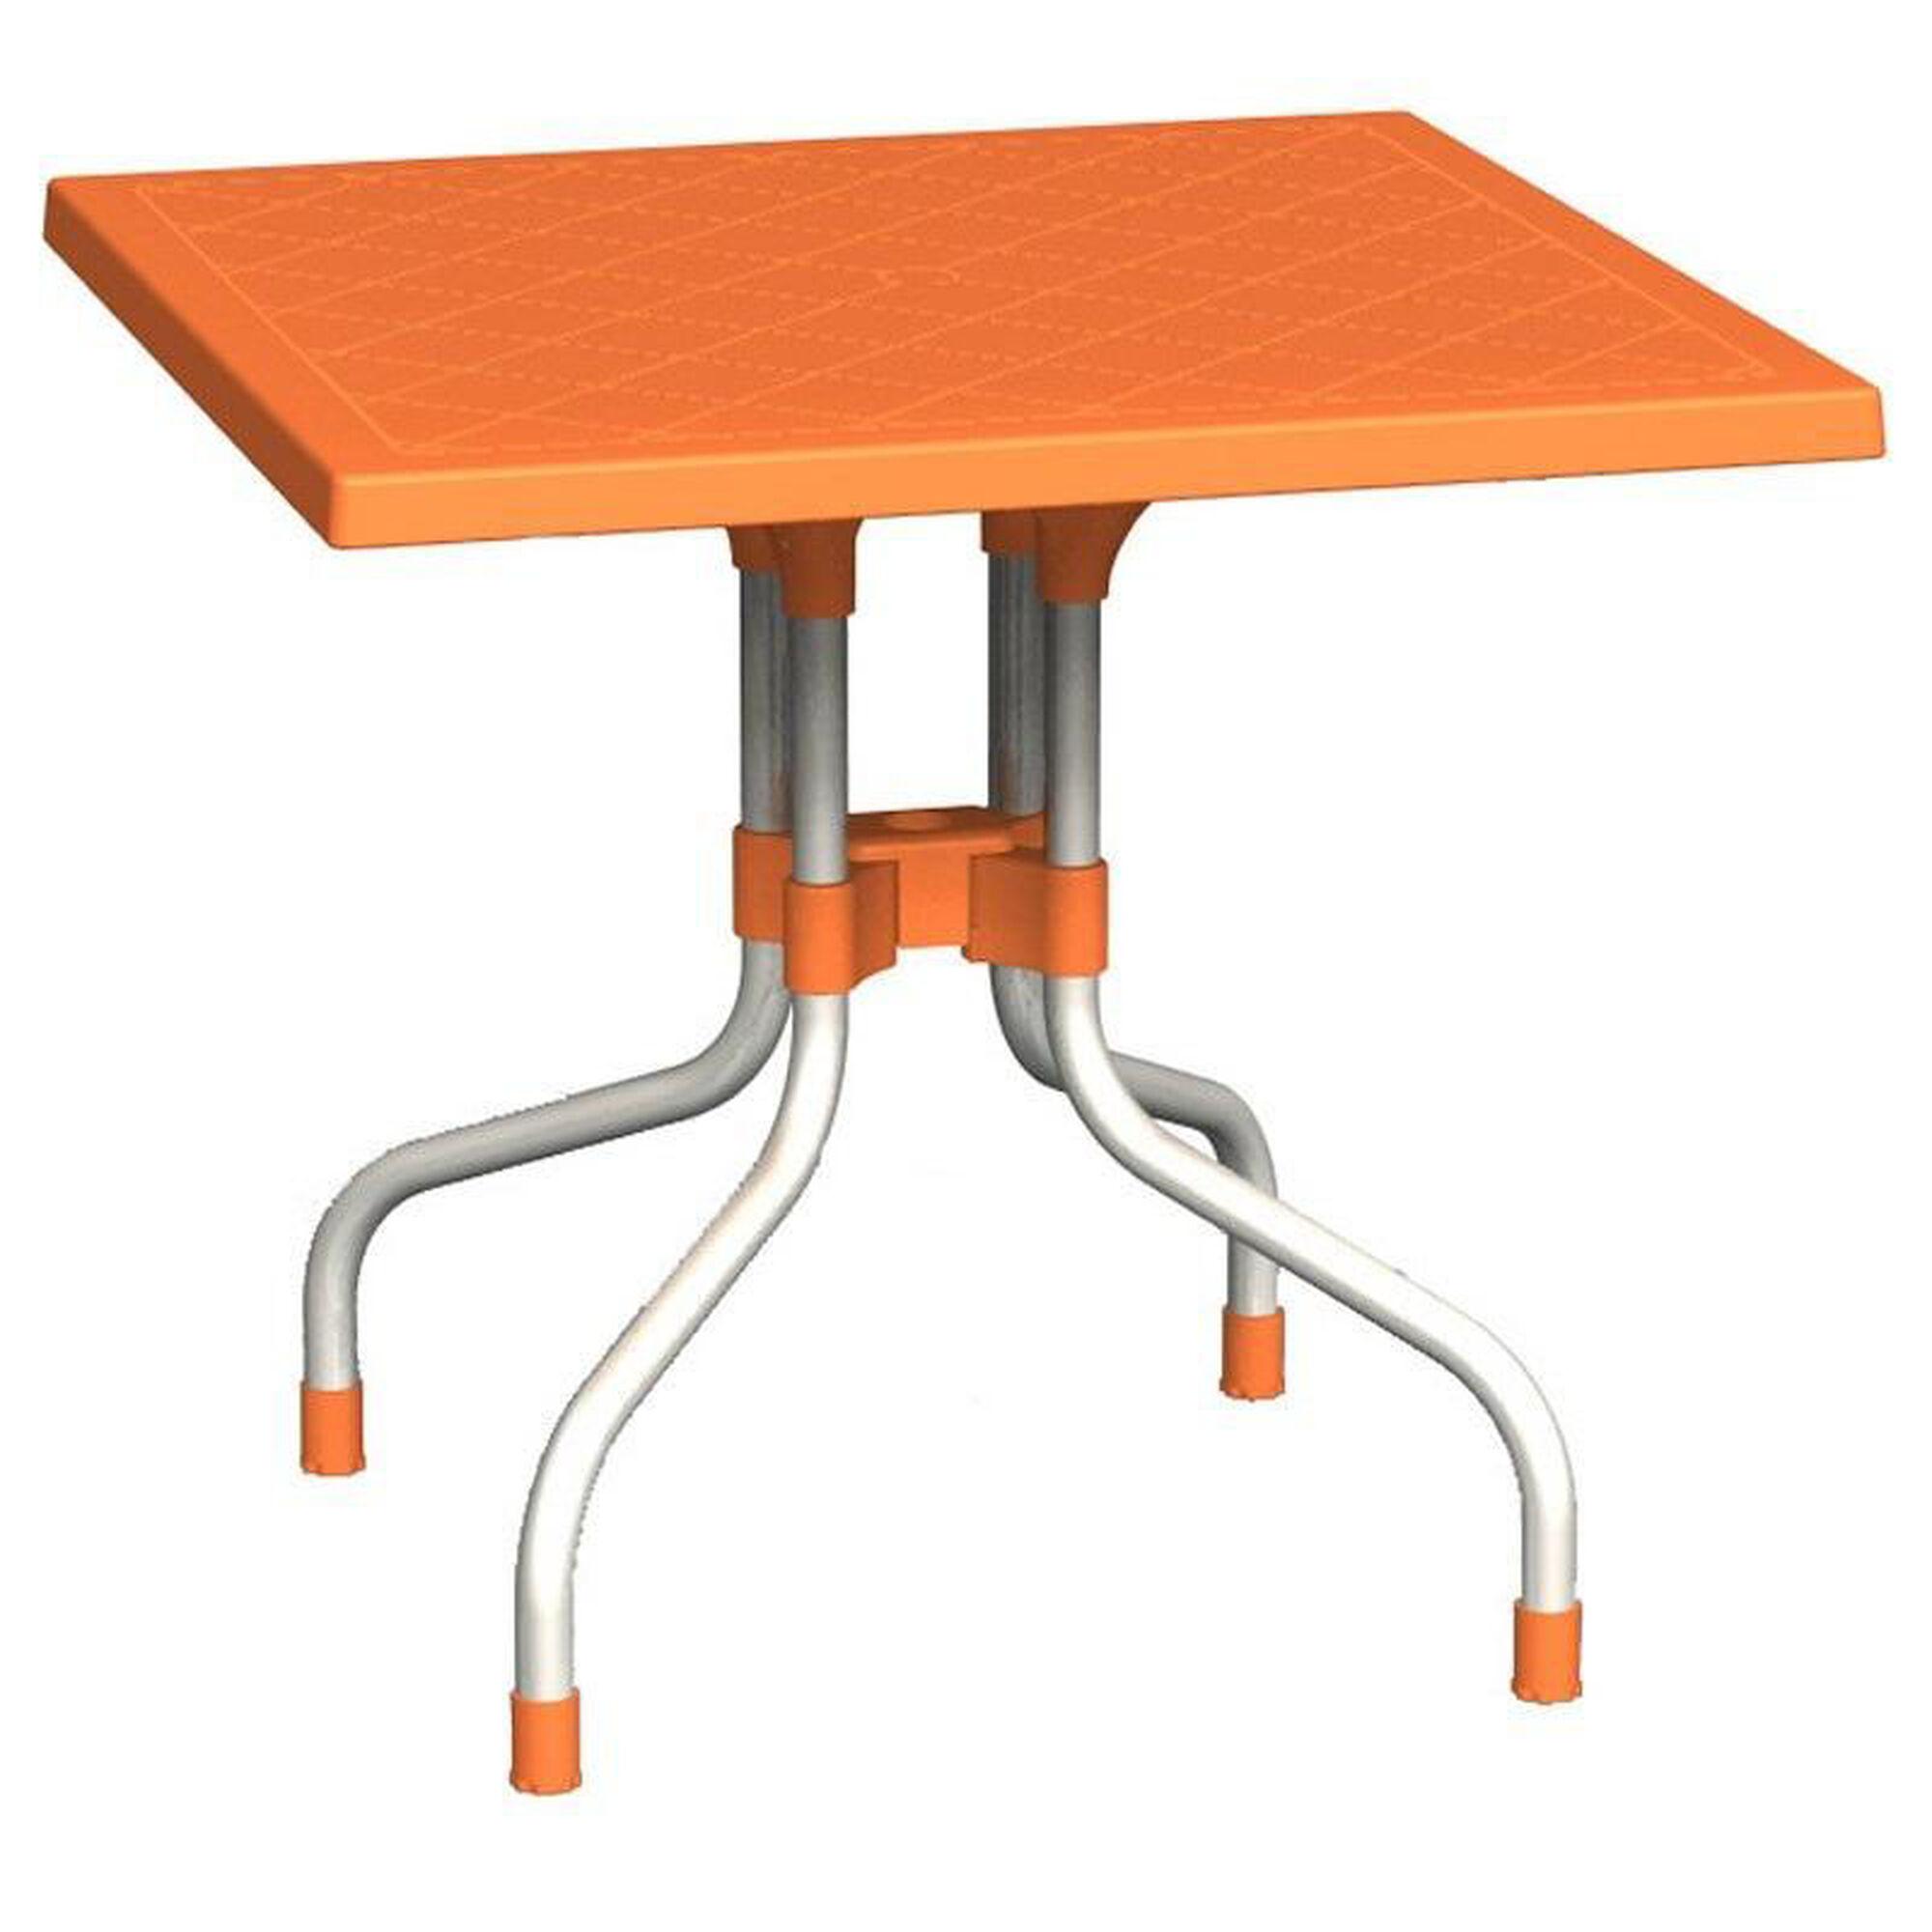 Orange Folding Dining Table Isp770 Ora Restaurantfurniture4less Com